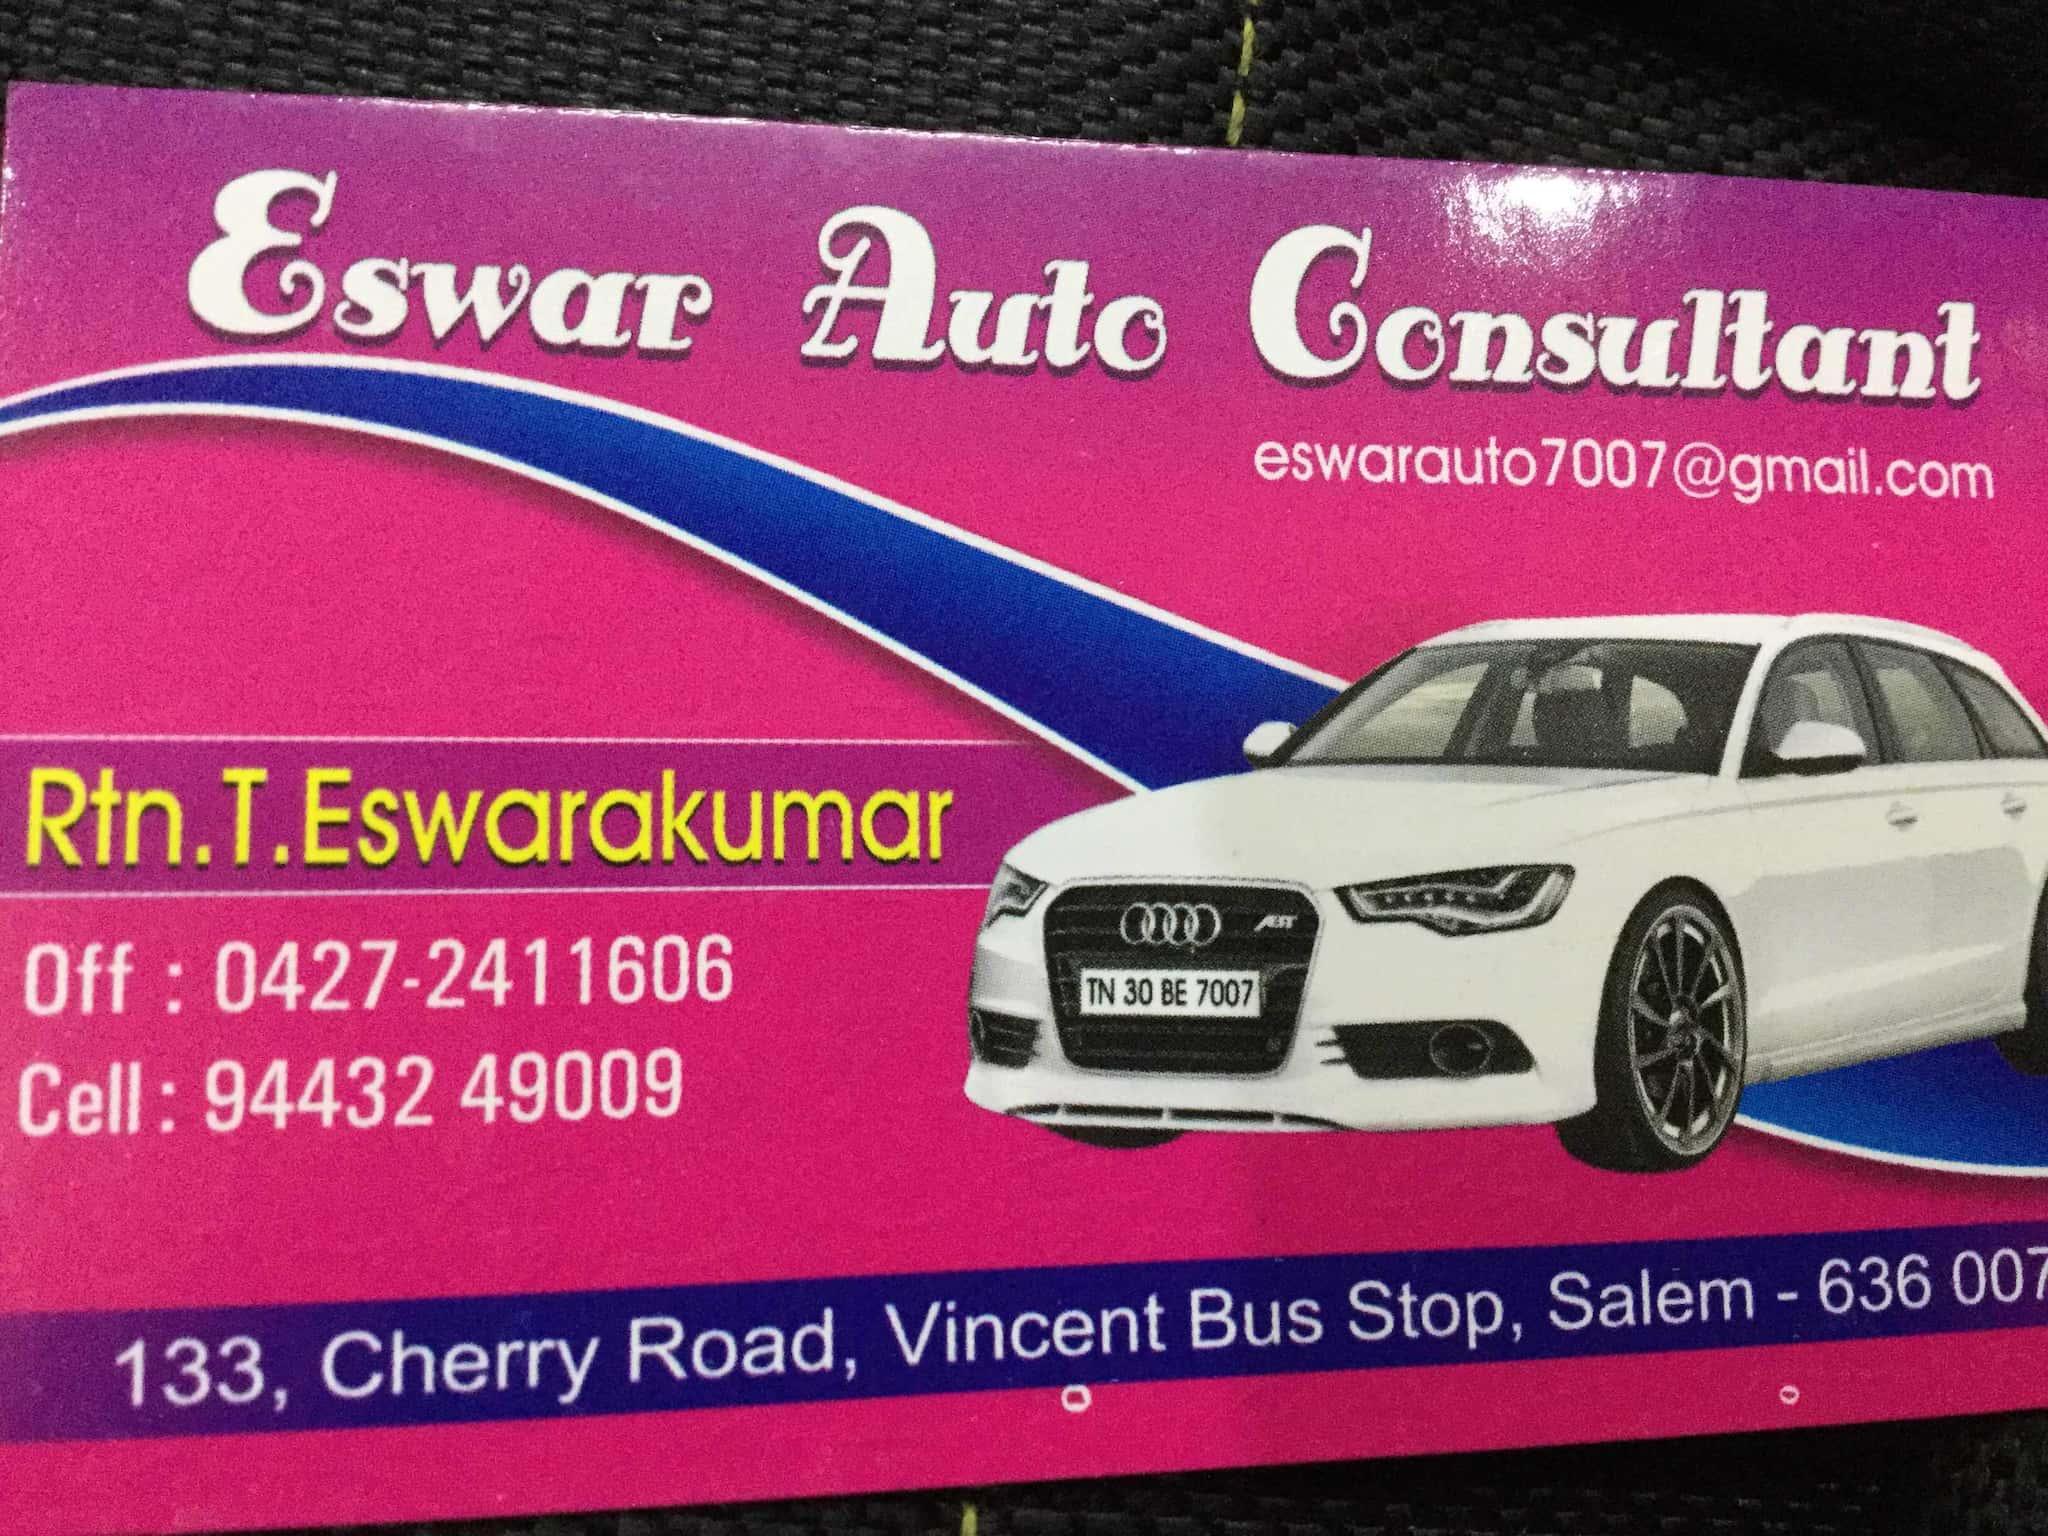 Eswar Auto Consultant, Hastampatti - RTO Consultants in Salem - Justdial